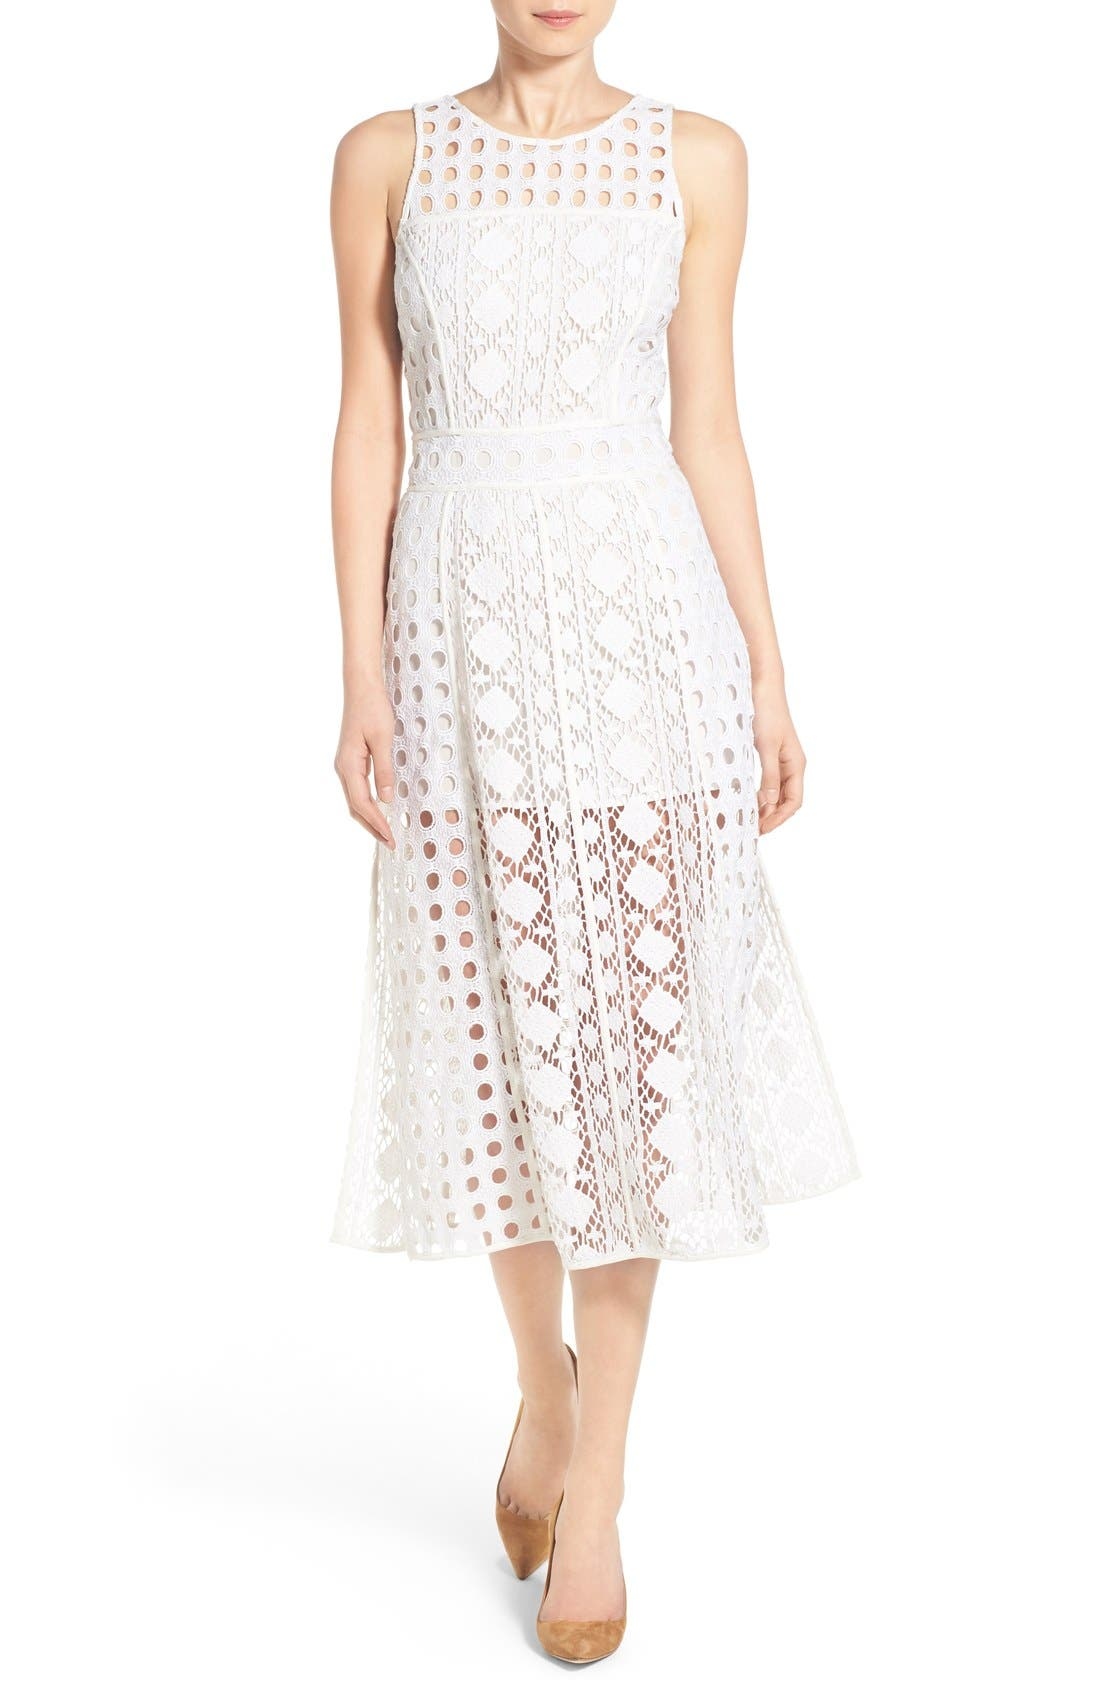 OLIVIA PALERMO + CHELSEA28, Patchwork Lace Midi Dress, Main thumbnail 1, color, 100